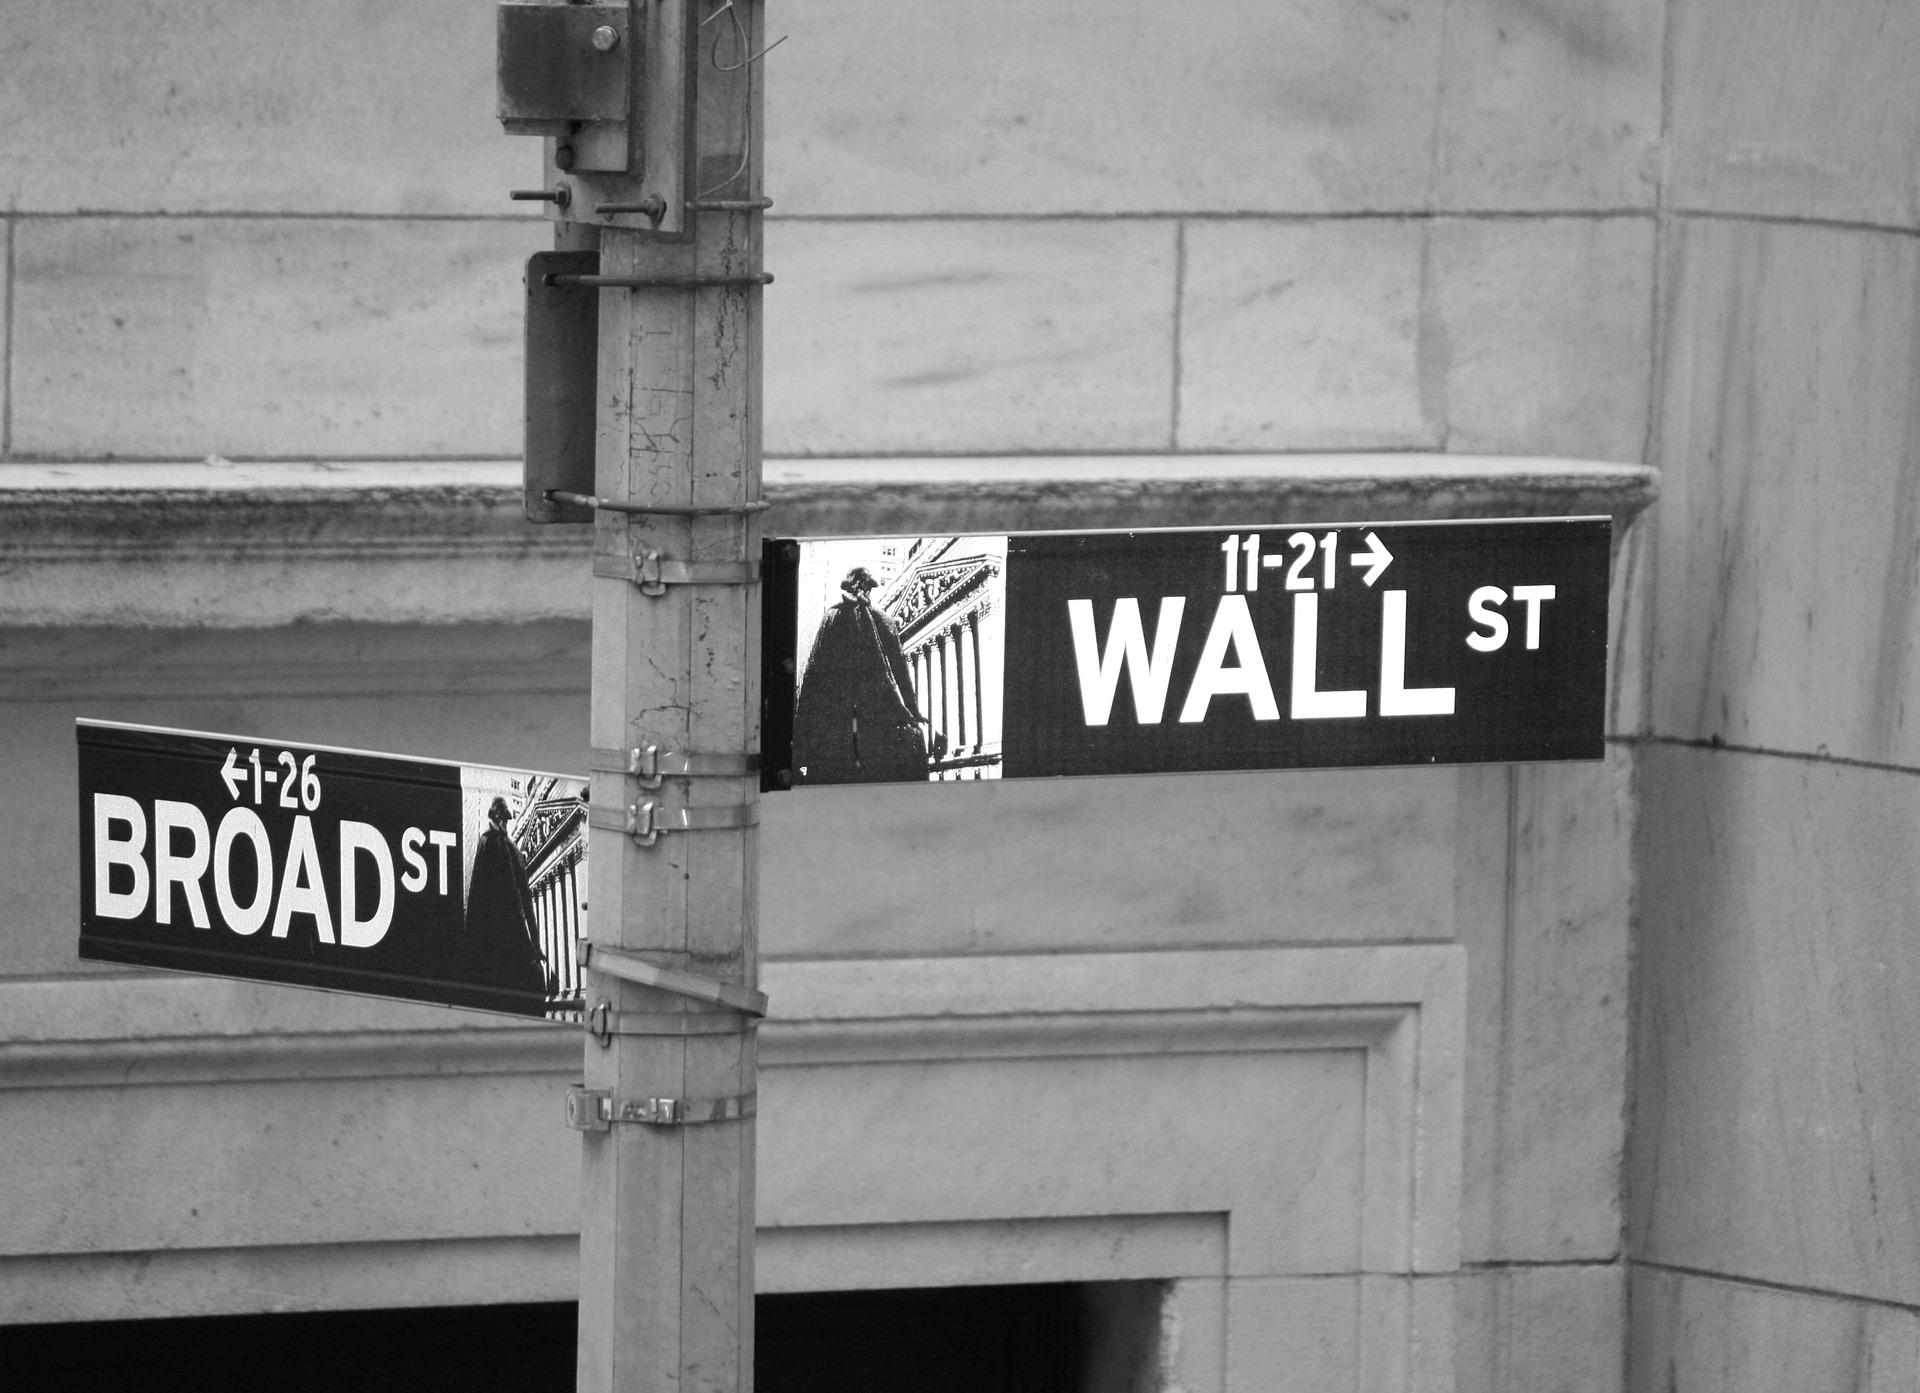 Ein Straßenschild an der Wall Street weist den Weg